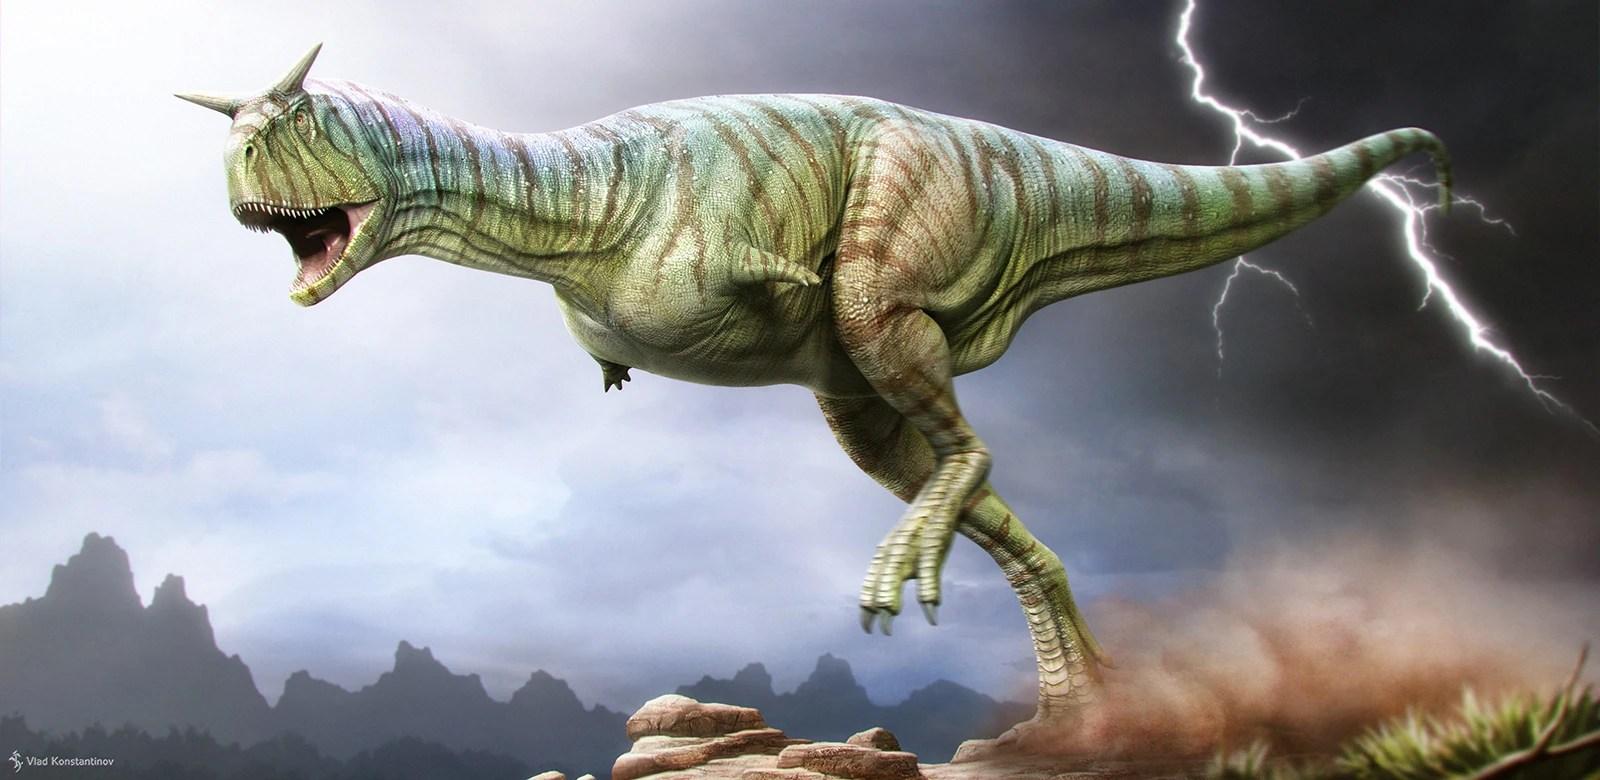 Wallpaper Skull 3d Carnotaurus Dinosaur Island Wikia Fandom Powered By Wikia